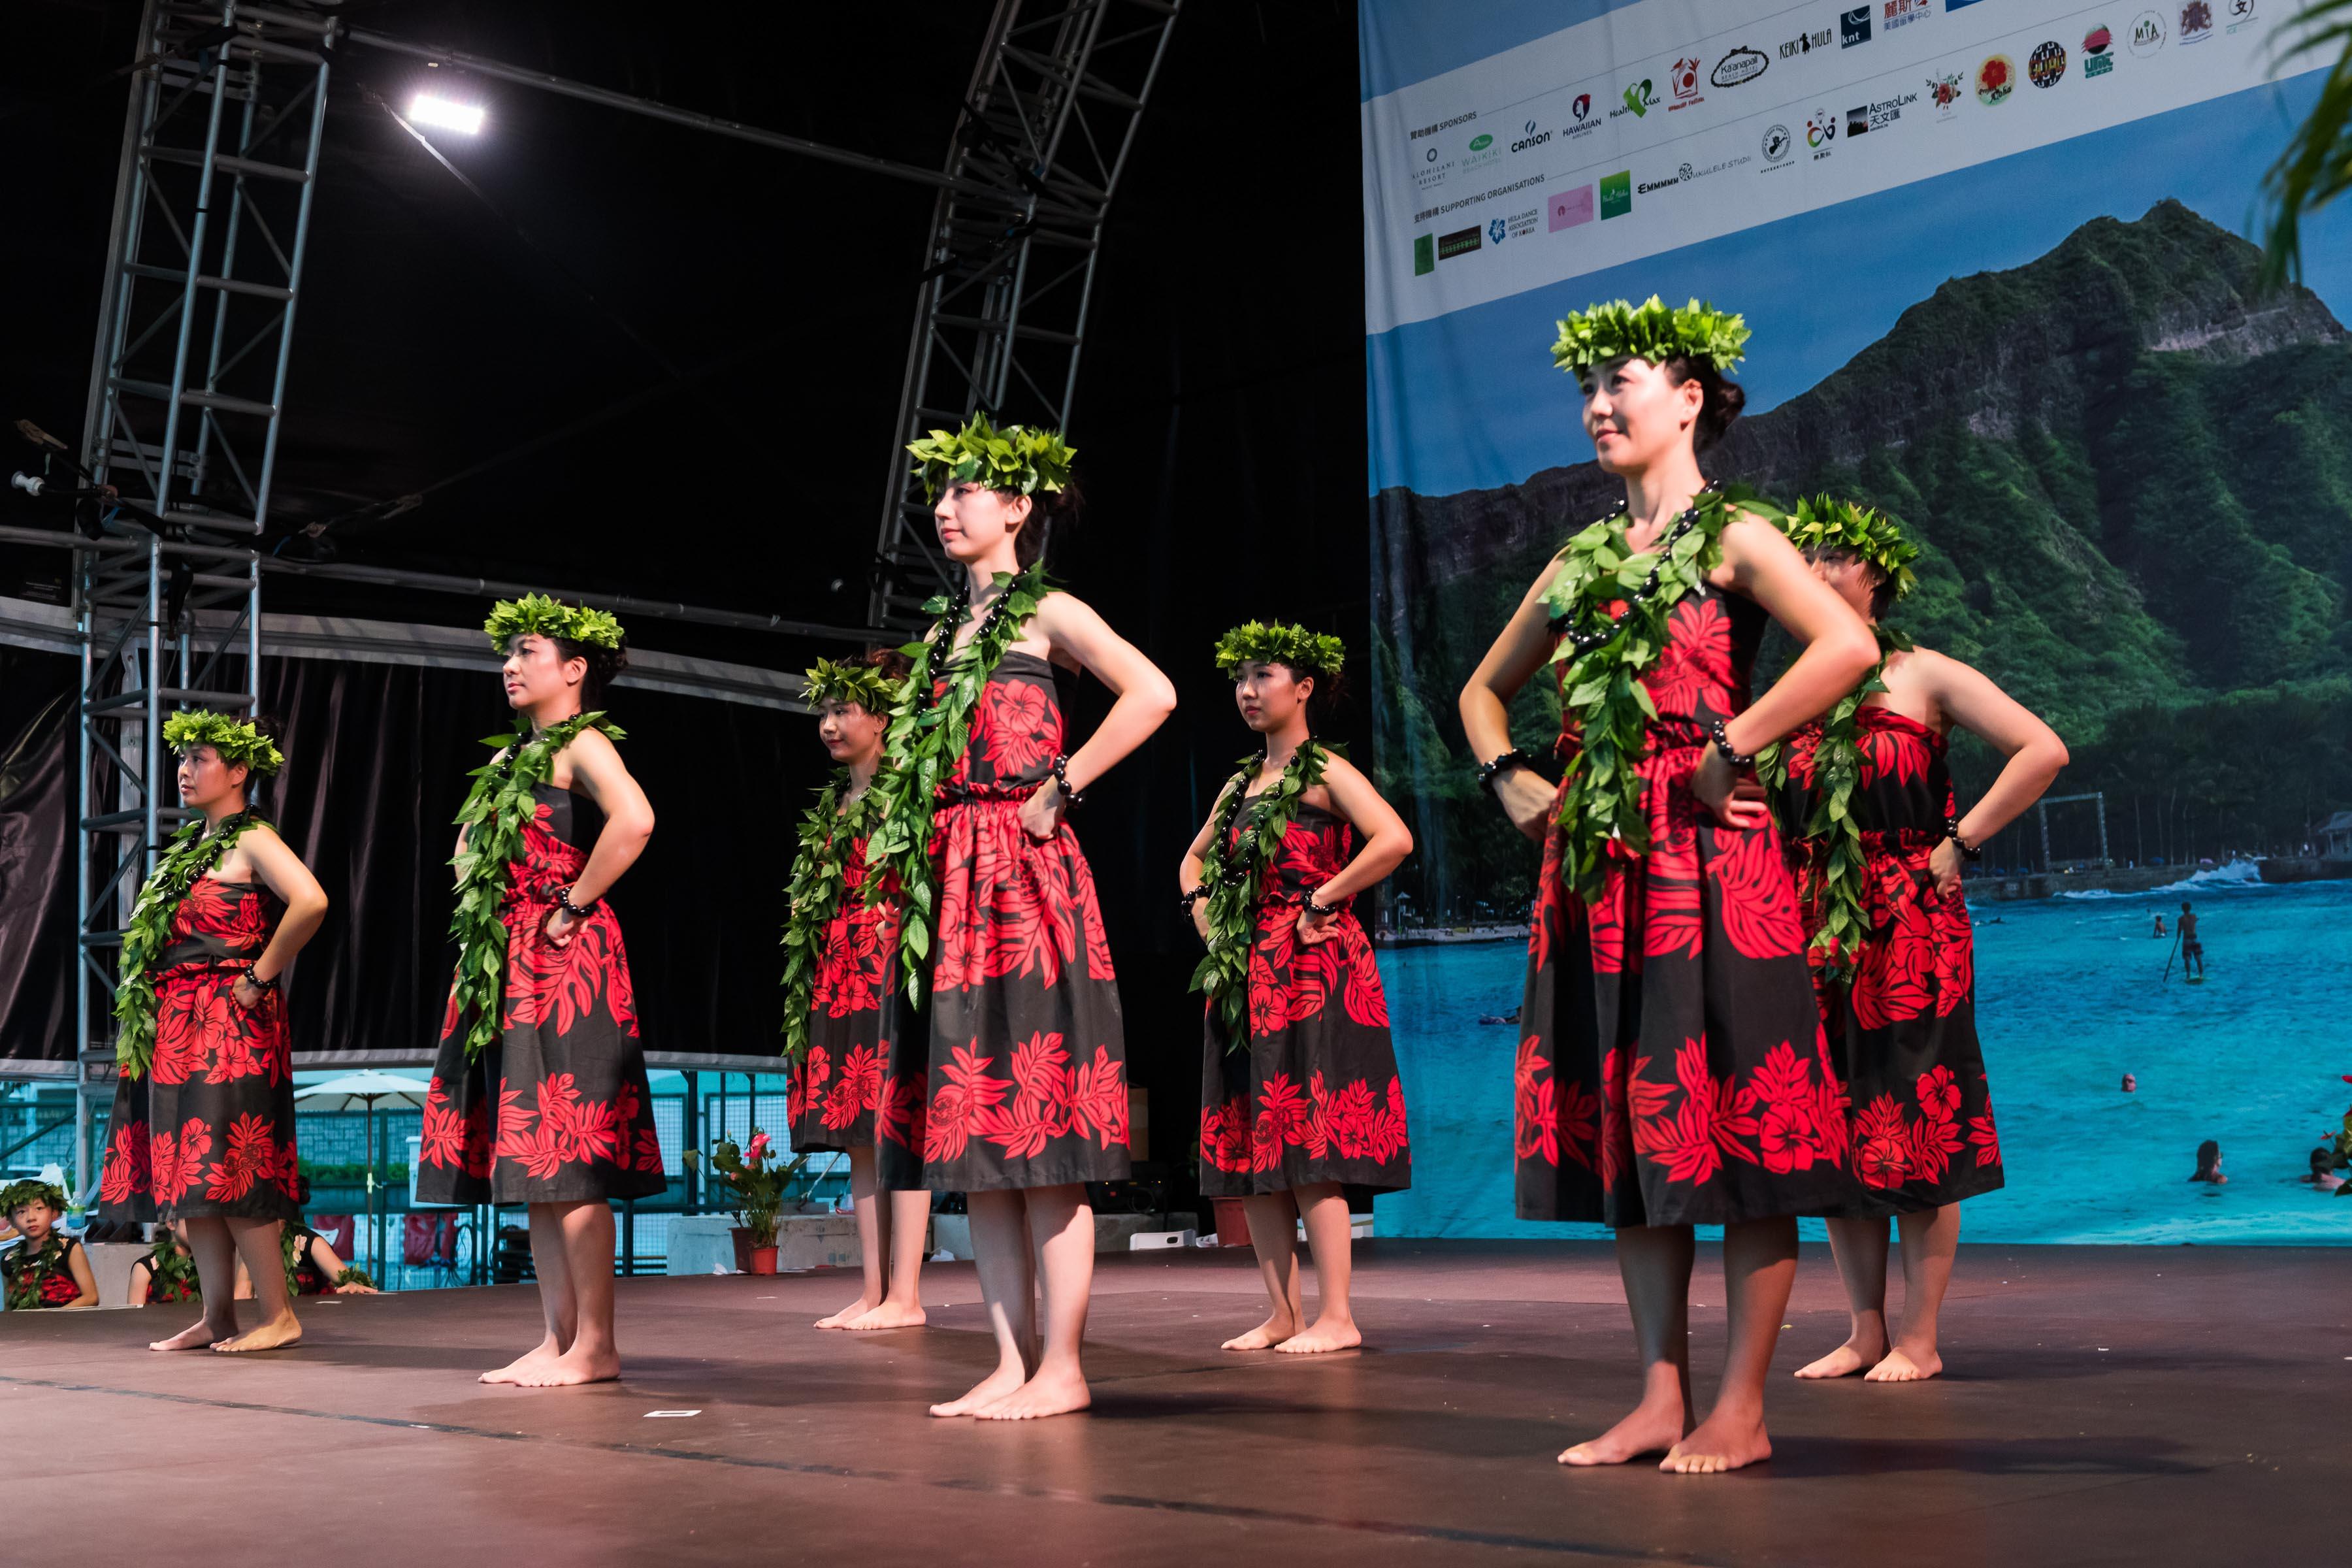 Aloha Festival 2019: Hawaii Arts Car